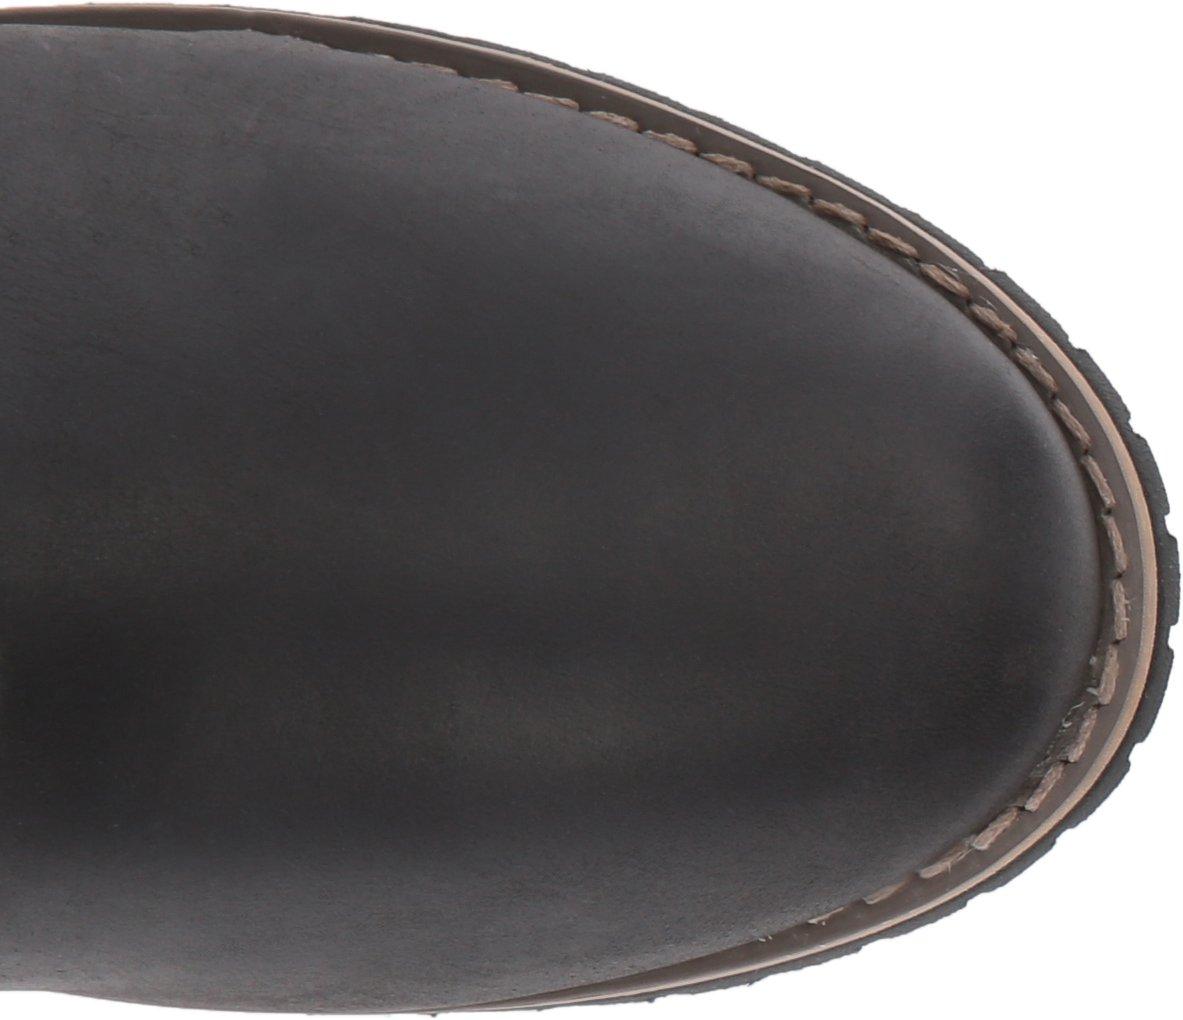 Columbia Women's Twentythird Ave Waterproof Tall Boot Uniform Dress Shoe, Black, Mud, 9 B US by Columbia (Image #9)